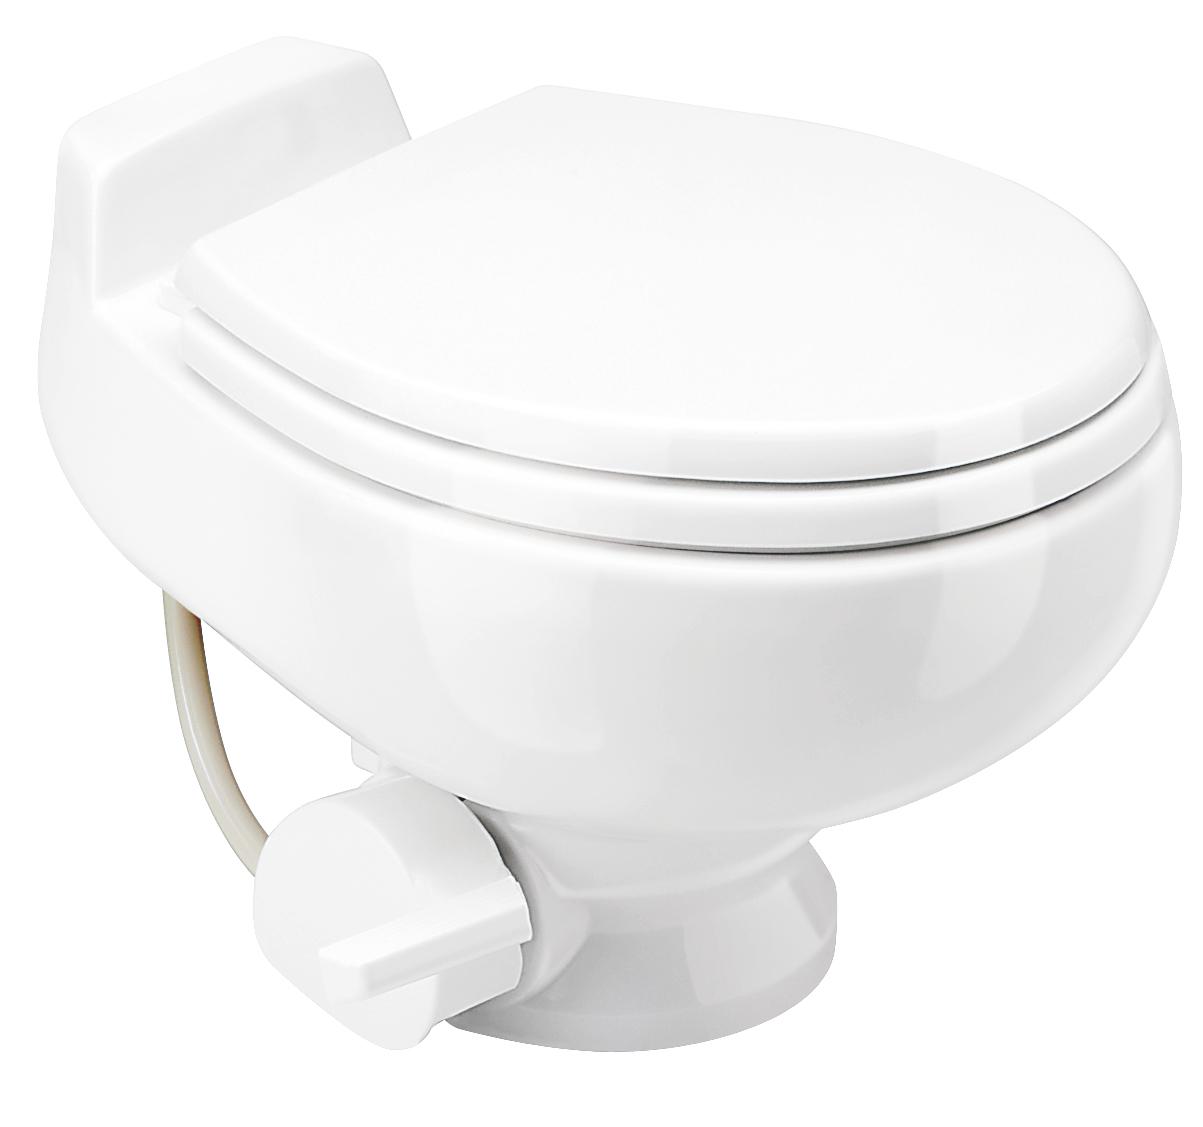 Sealand Dometic 506 Series Vacuflush Toilet Low